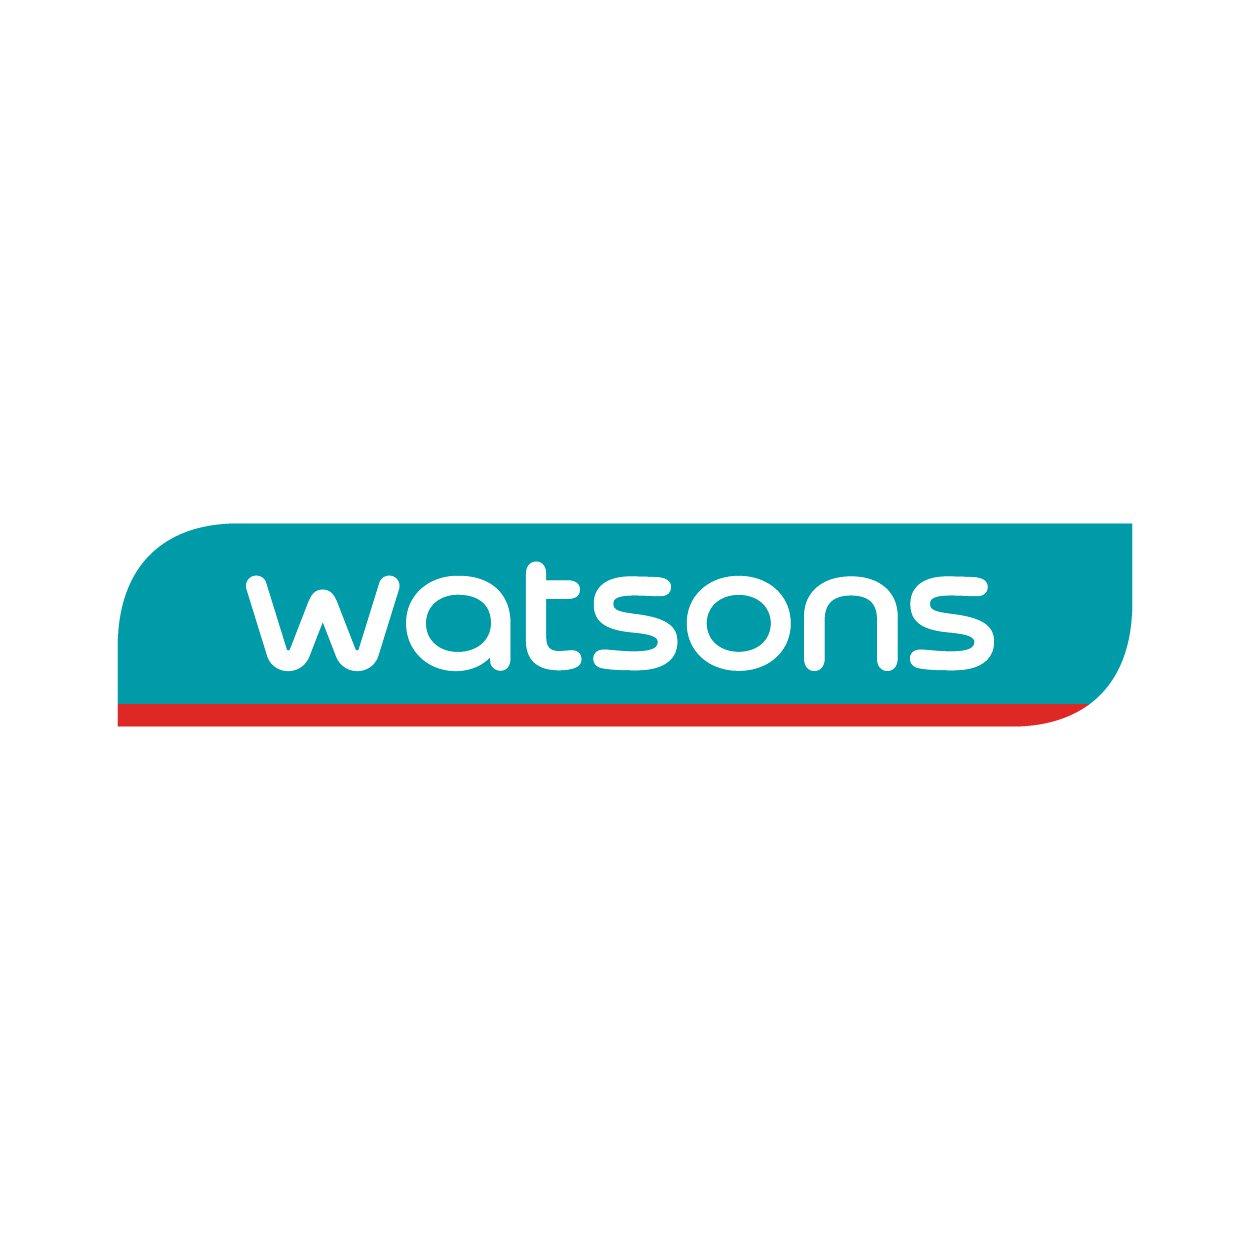 new-eretailer-logo-watsons.jpg